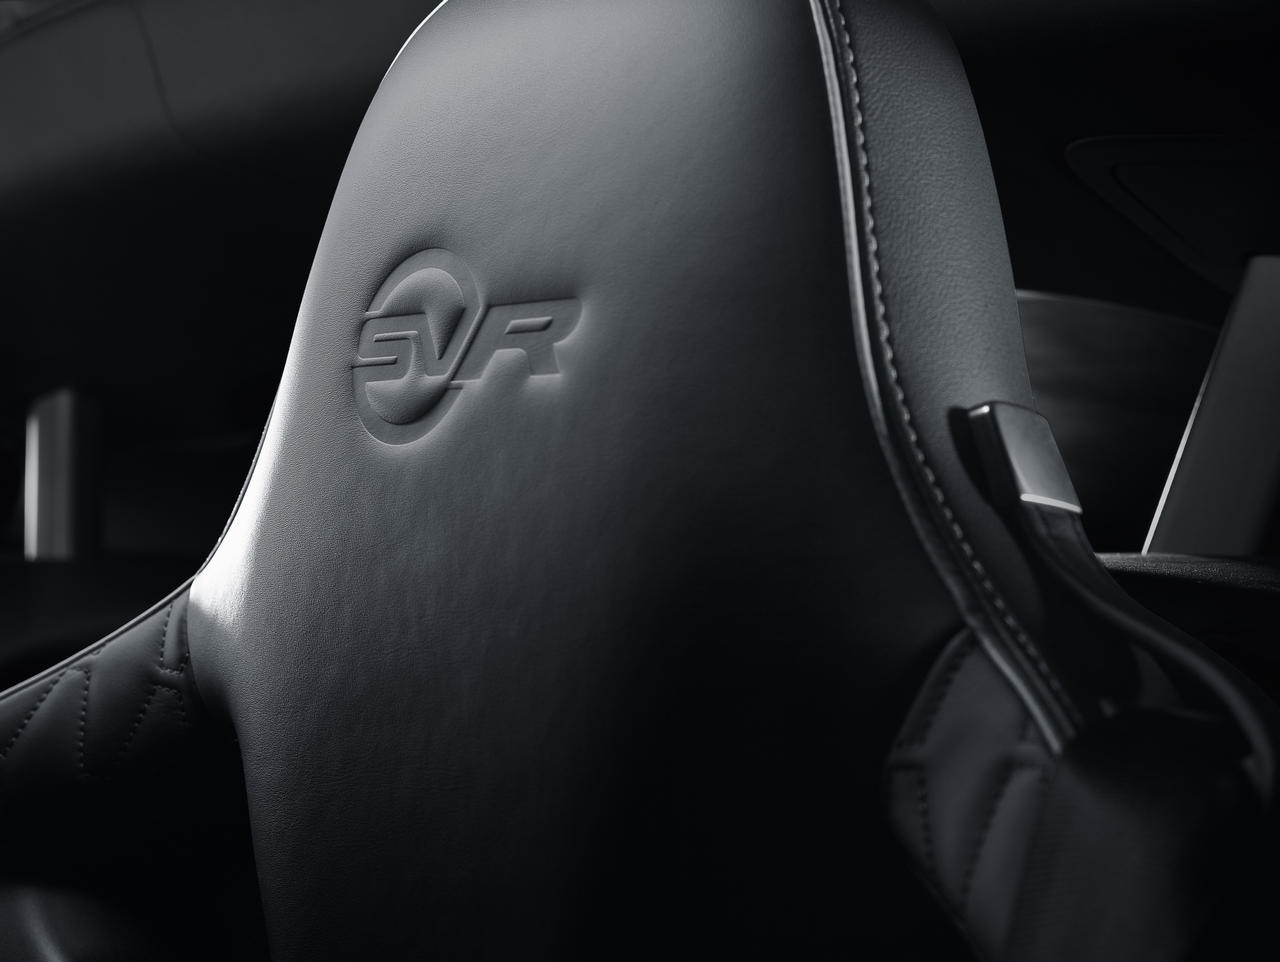 jaguar-f-type-convertible-SVR-geneva-2016_0-100_25